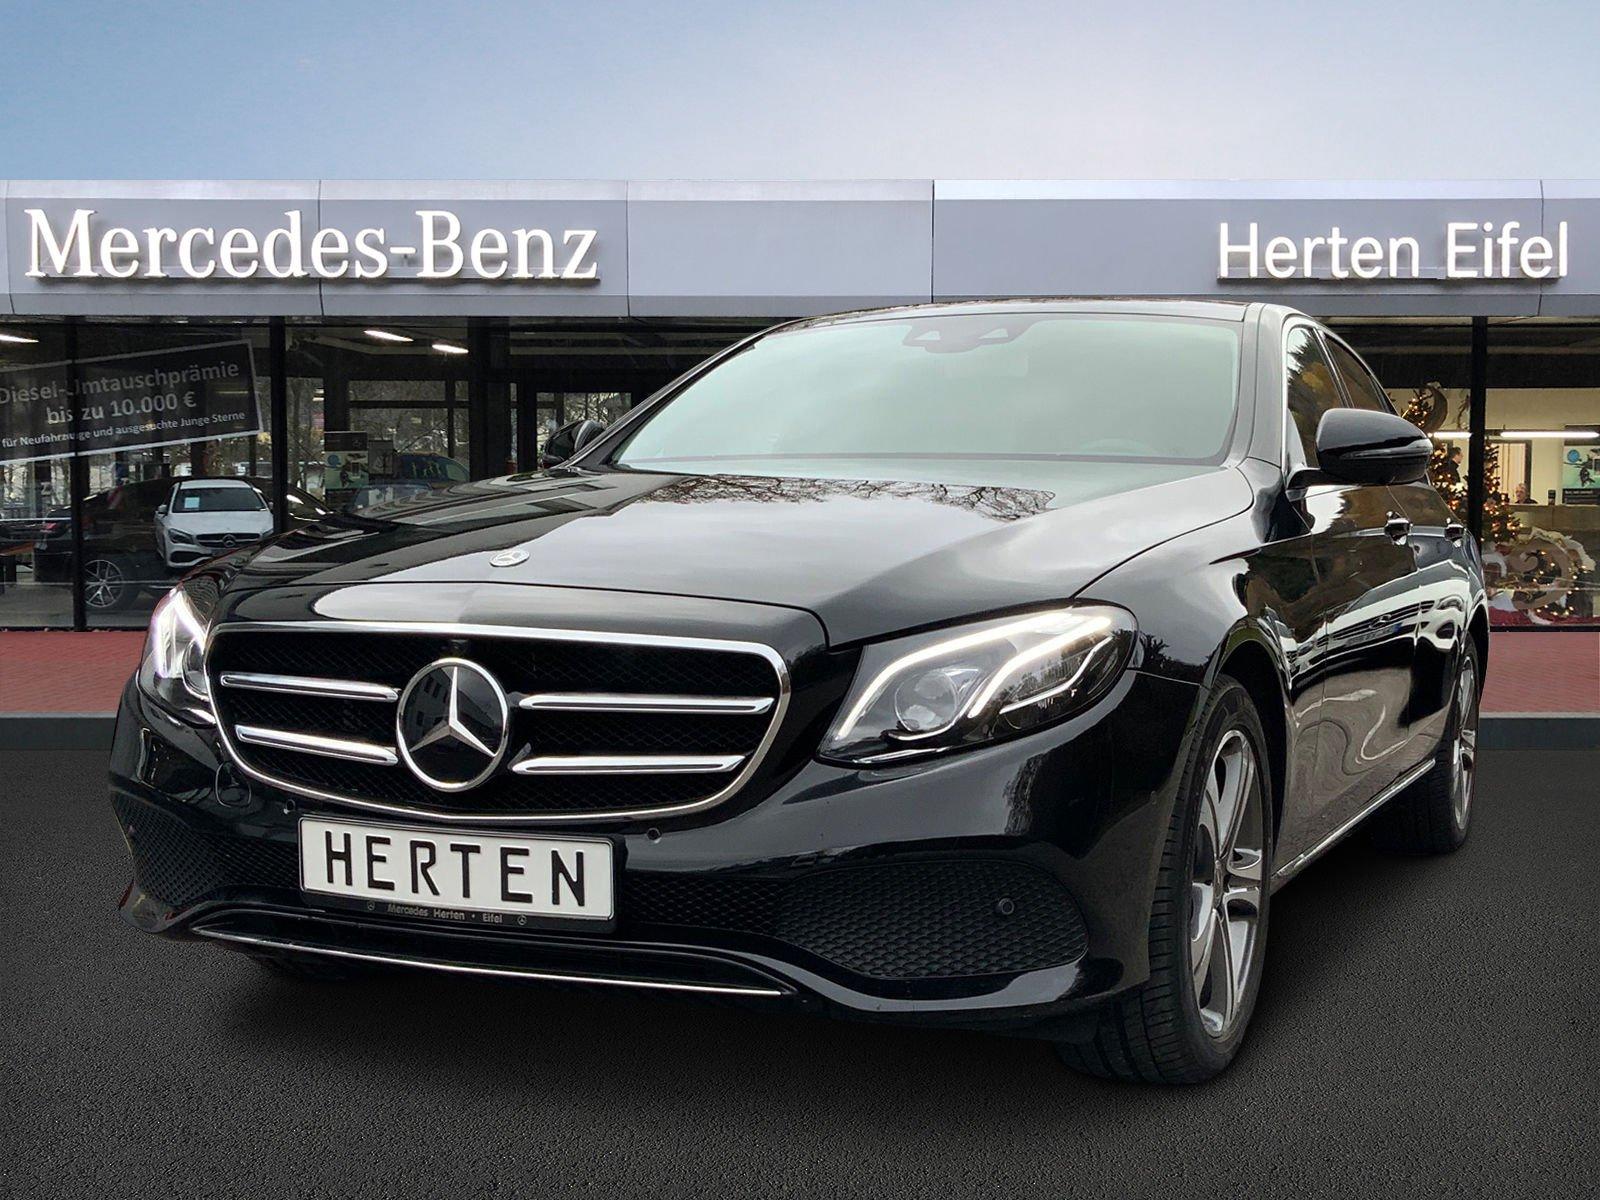 Mercedes-Benz E 450 4M COMAND+MULTIBEAM+WIDESCREEN+PANO+360, Jahr 2019, Benzin